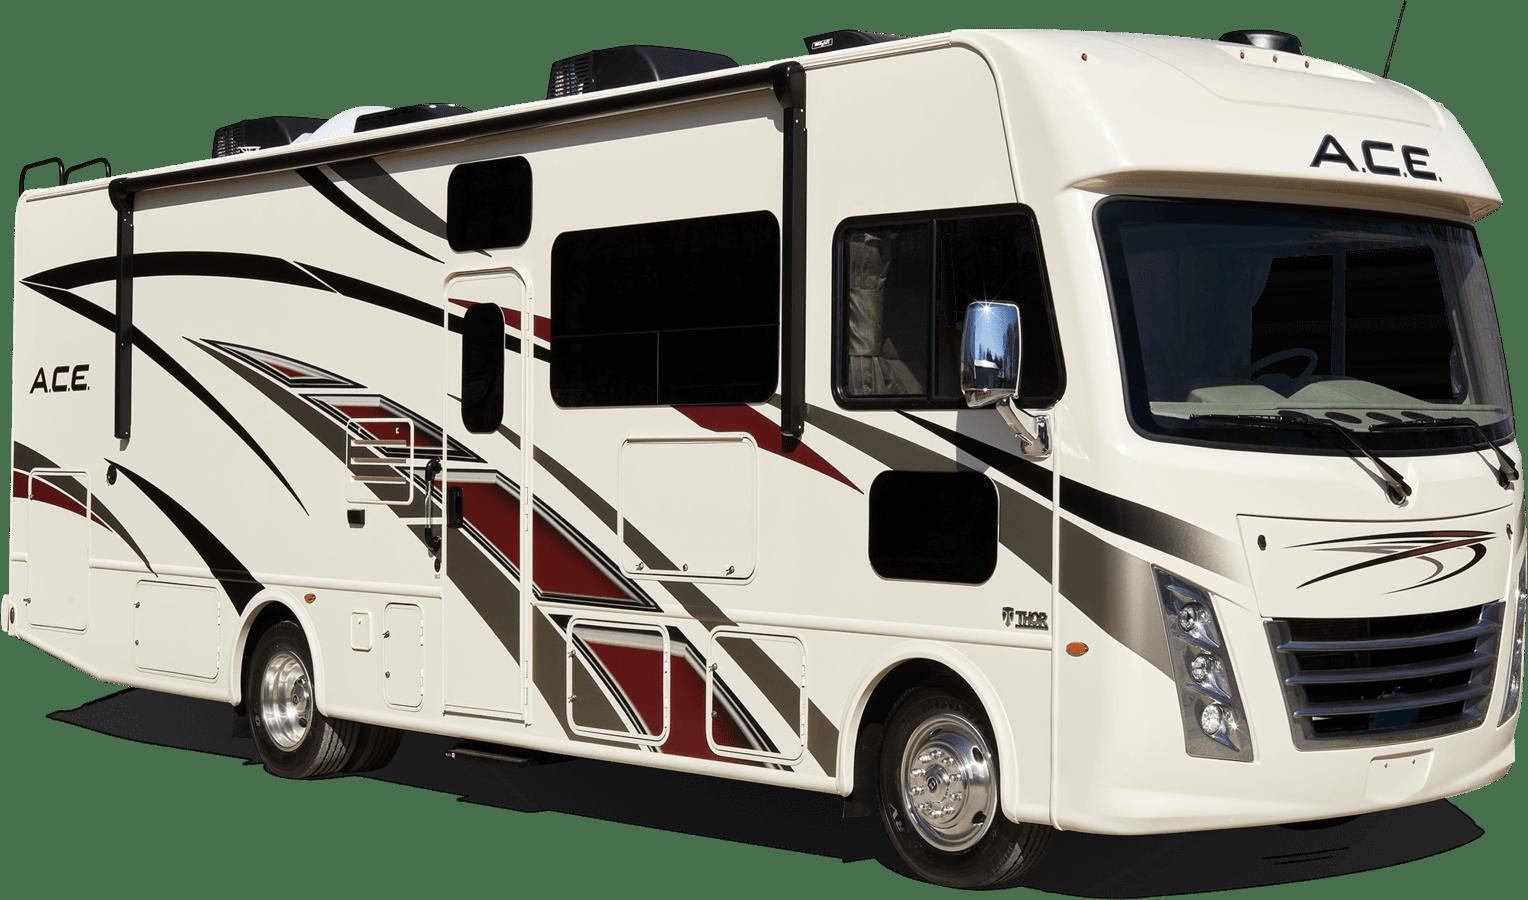 USED 2021 Thor Motor Coach ACE 30.4